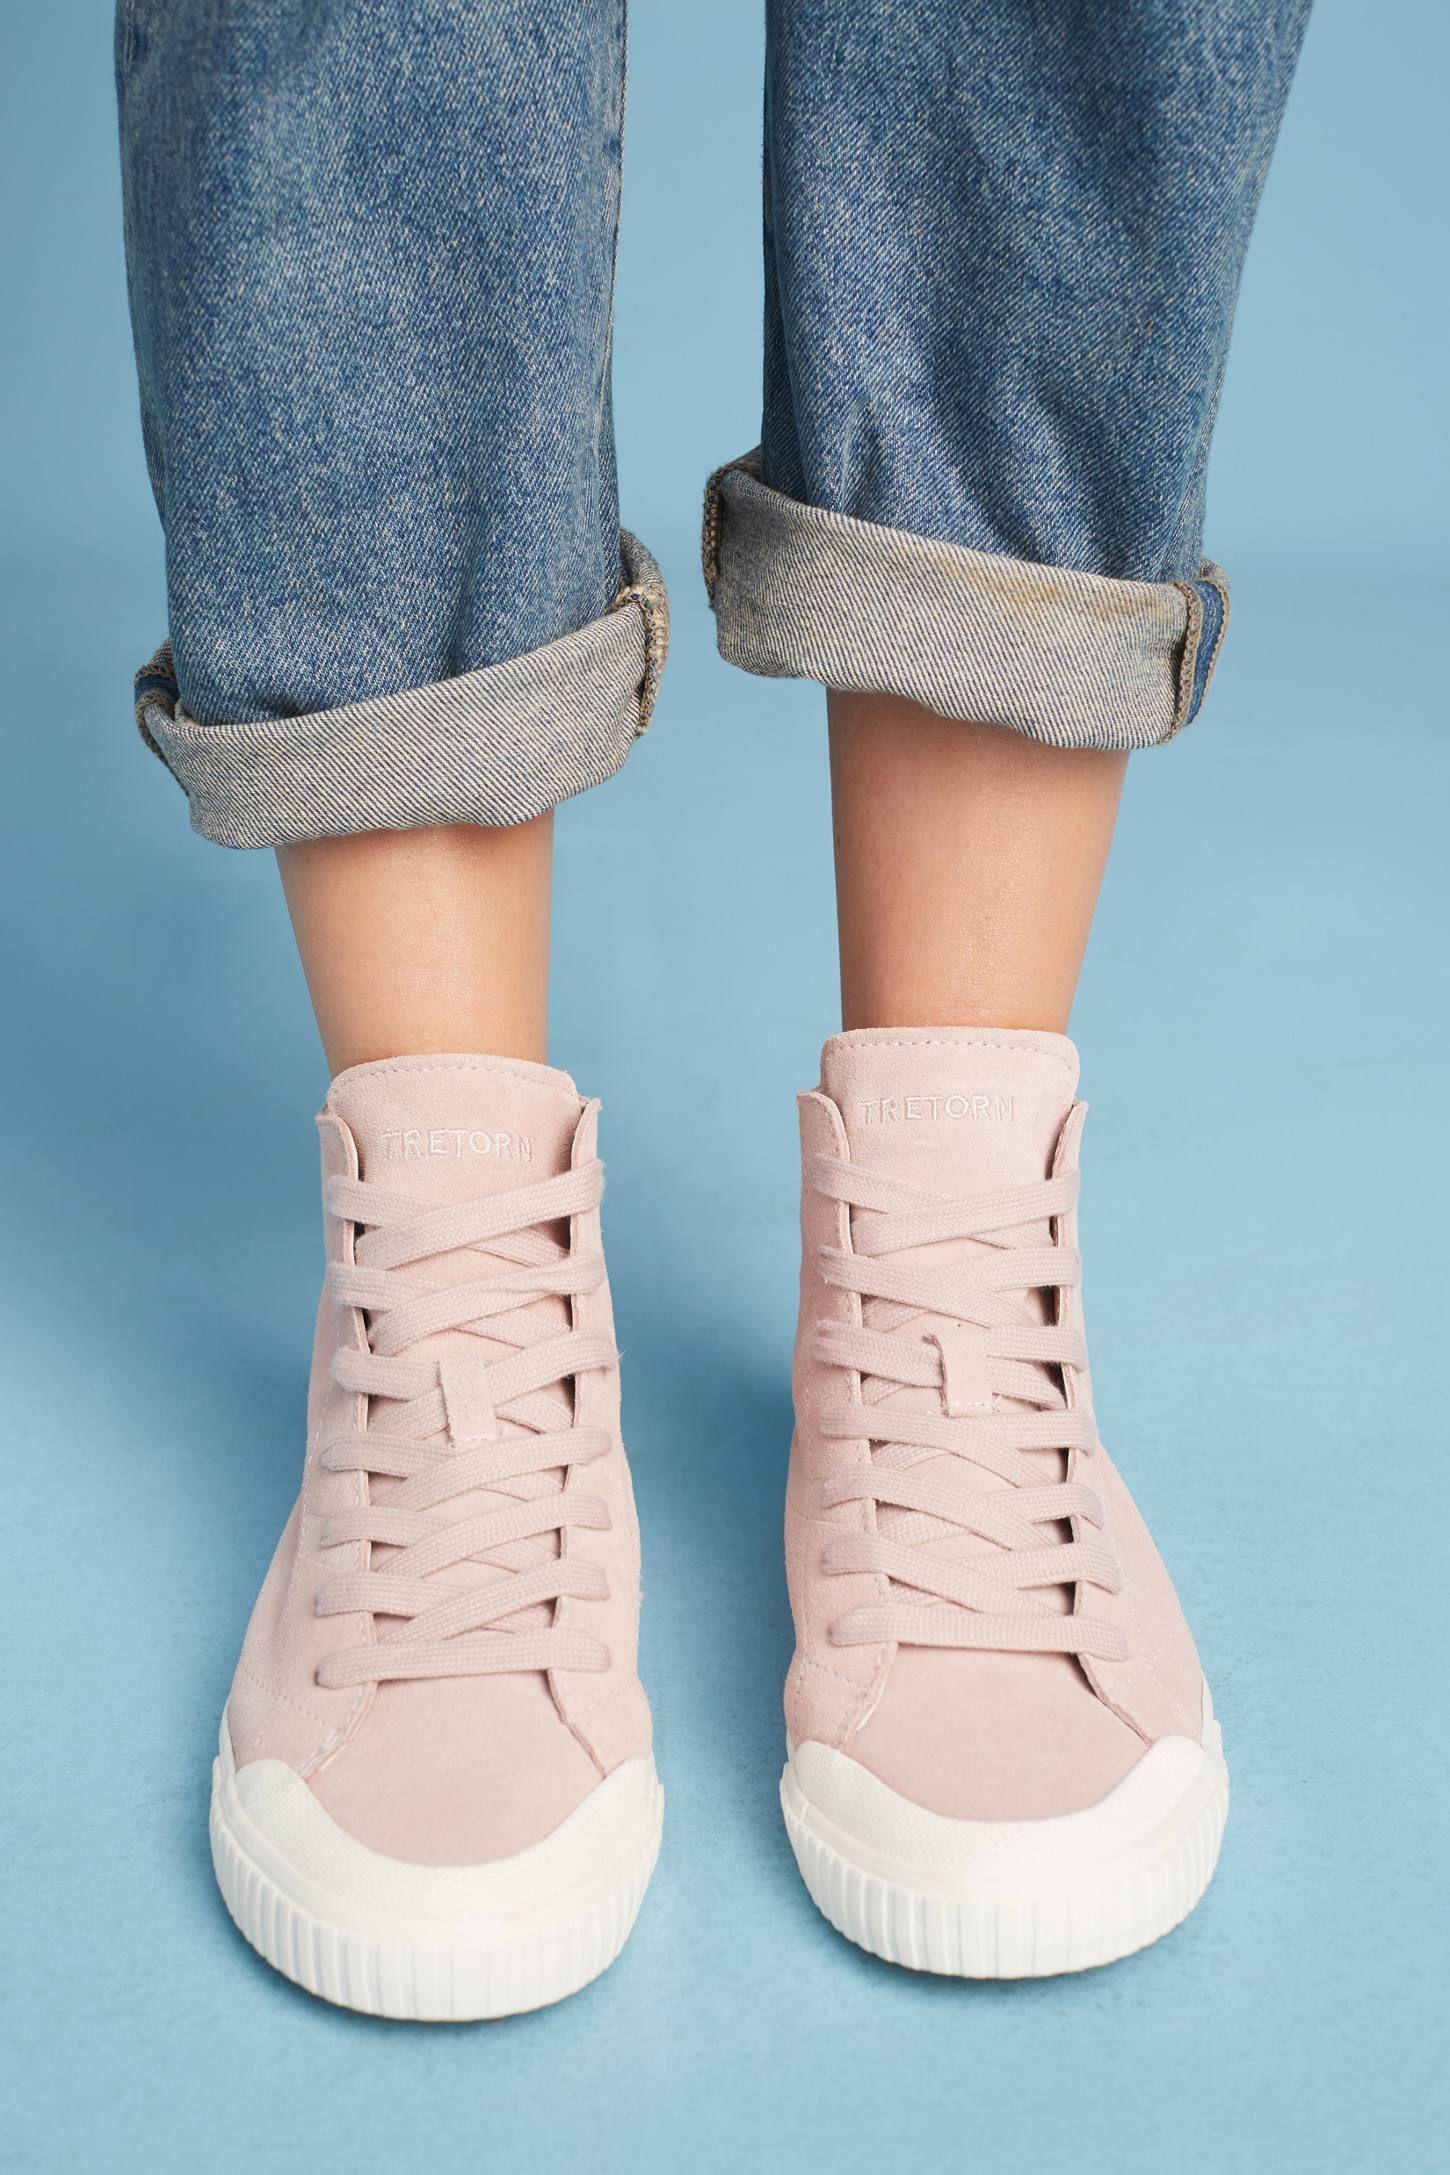 Tretorn Marley High-Top Sneakers | High